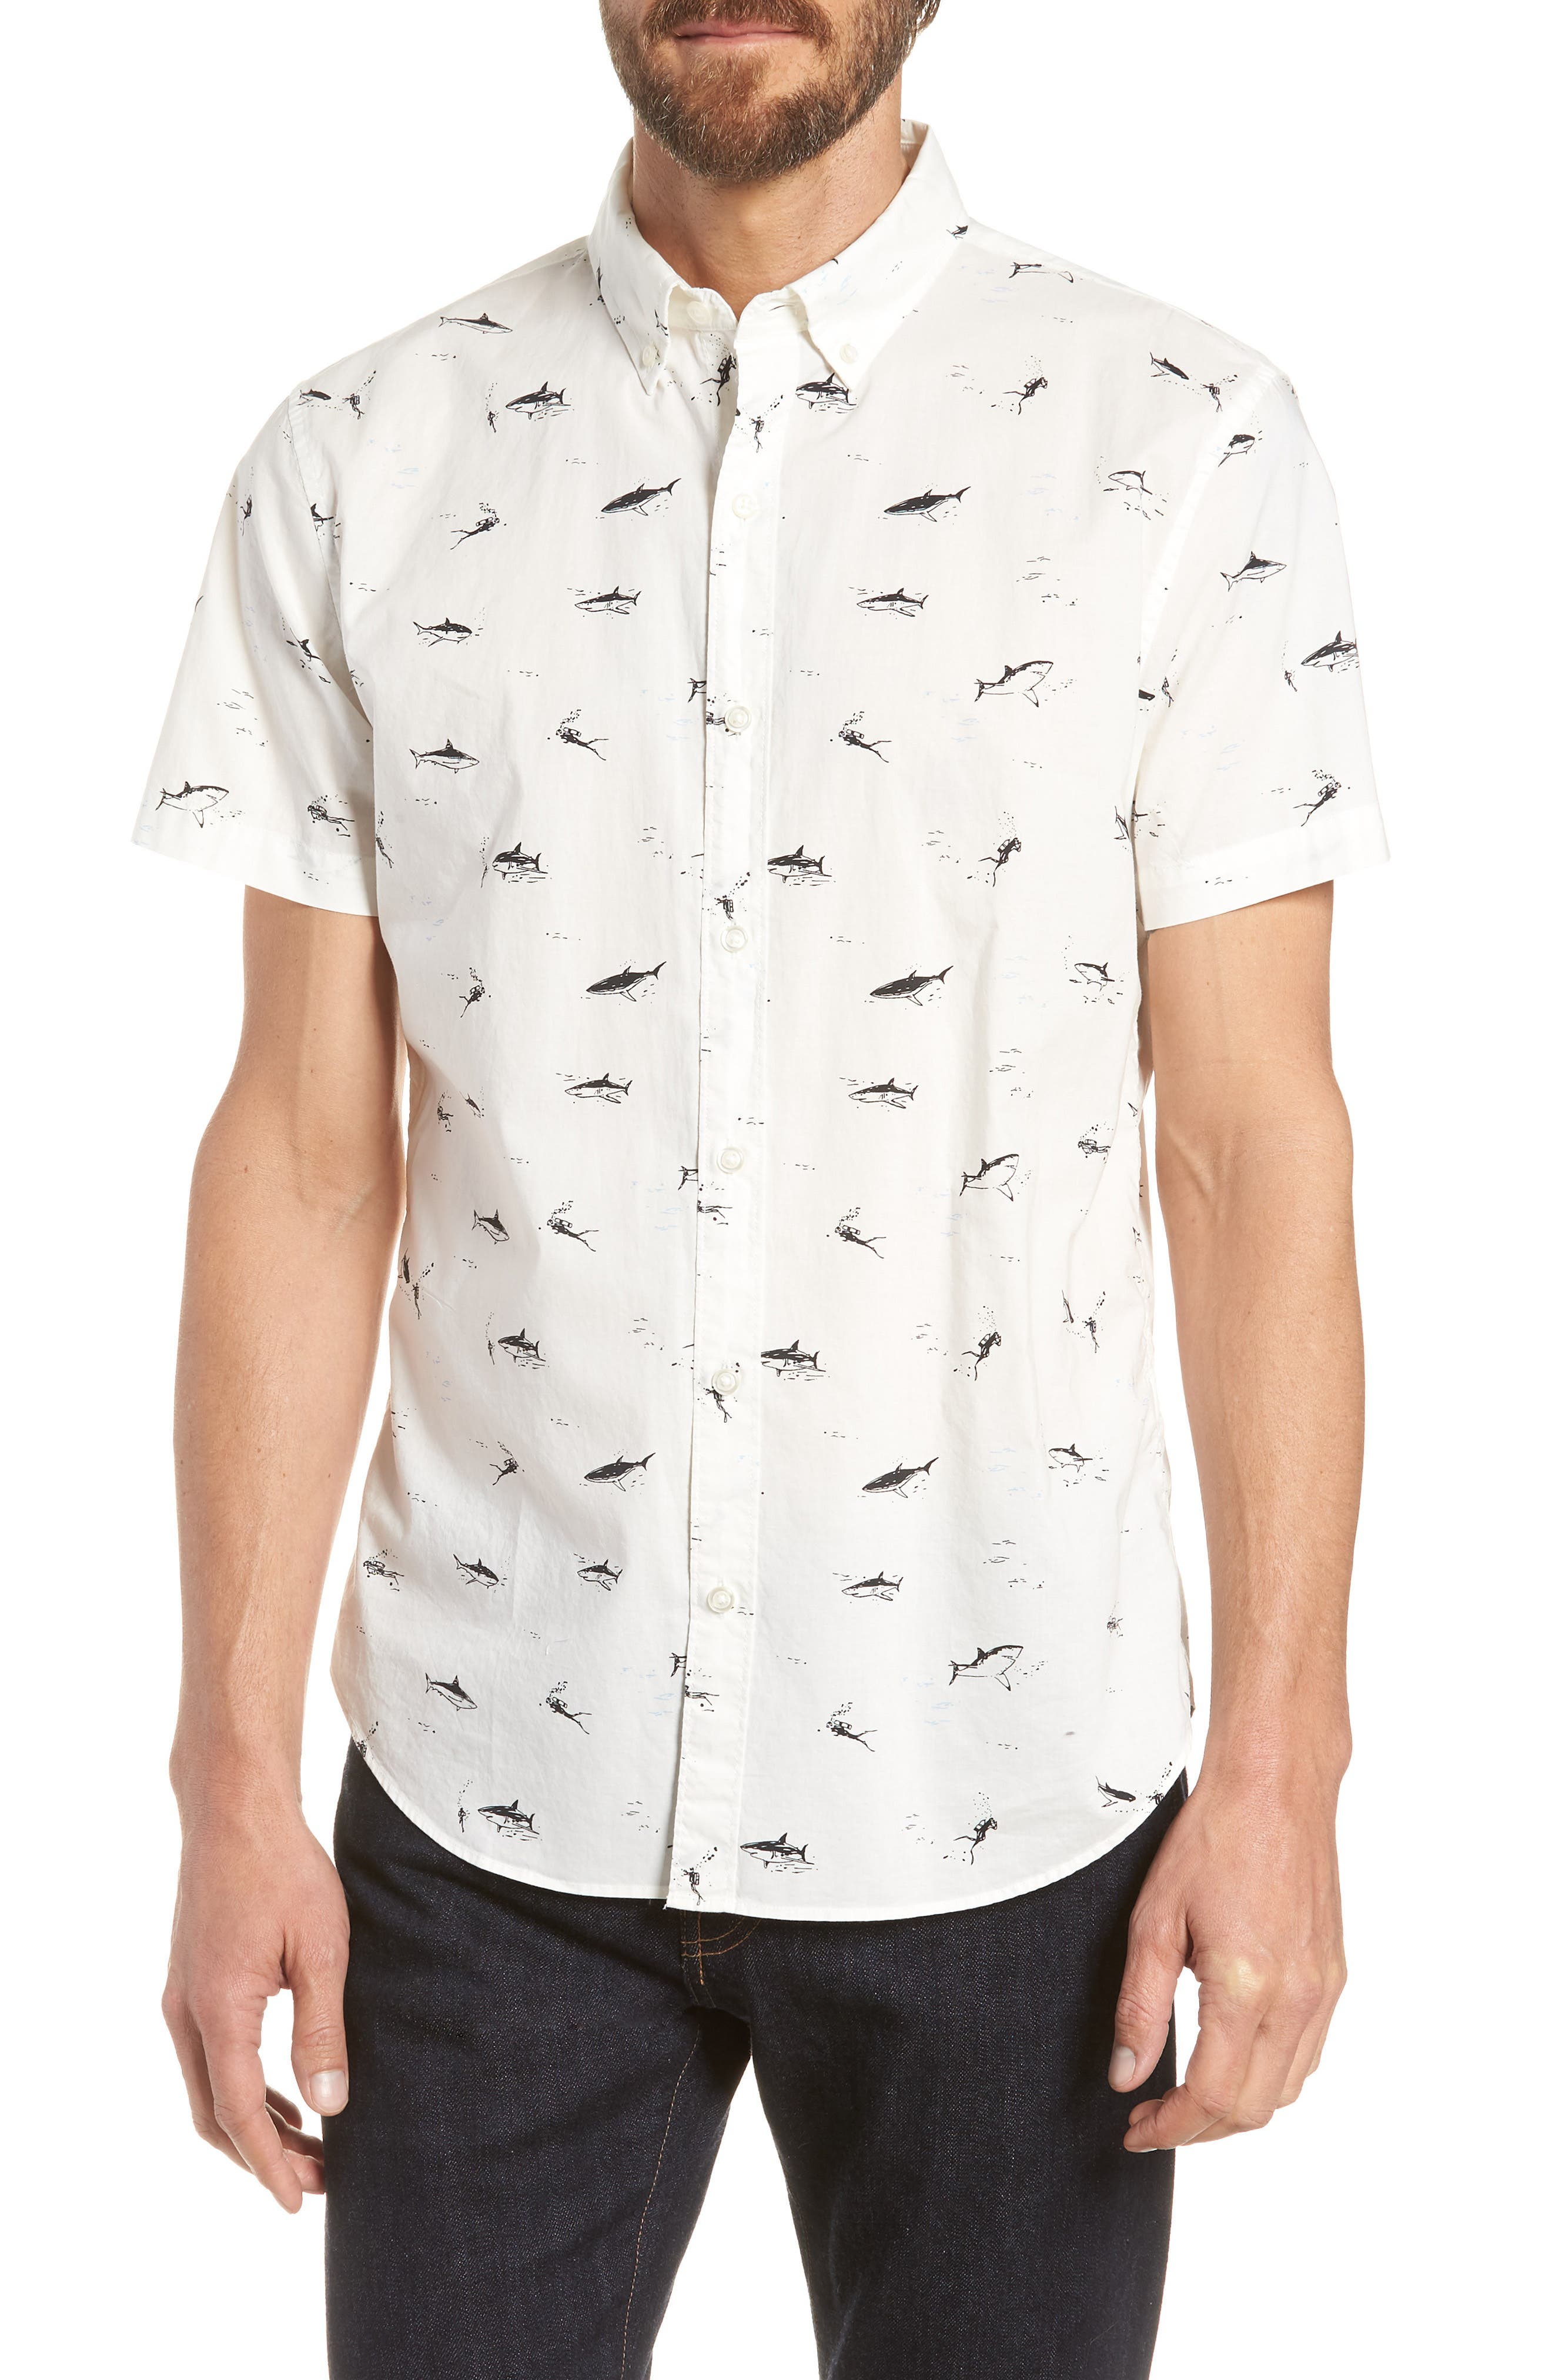 Riviera Slim Fit Shark Print Sport Shirt,                             Main thumbnail 1, color,                             Scuba Dive - Jet Black